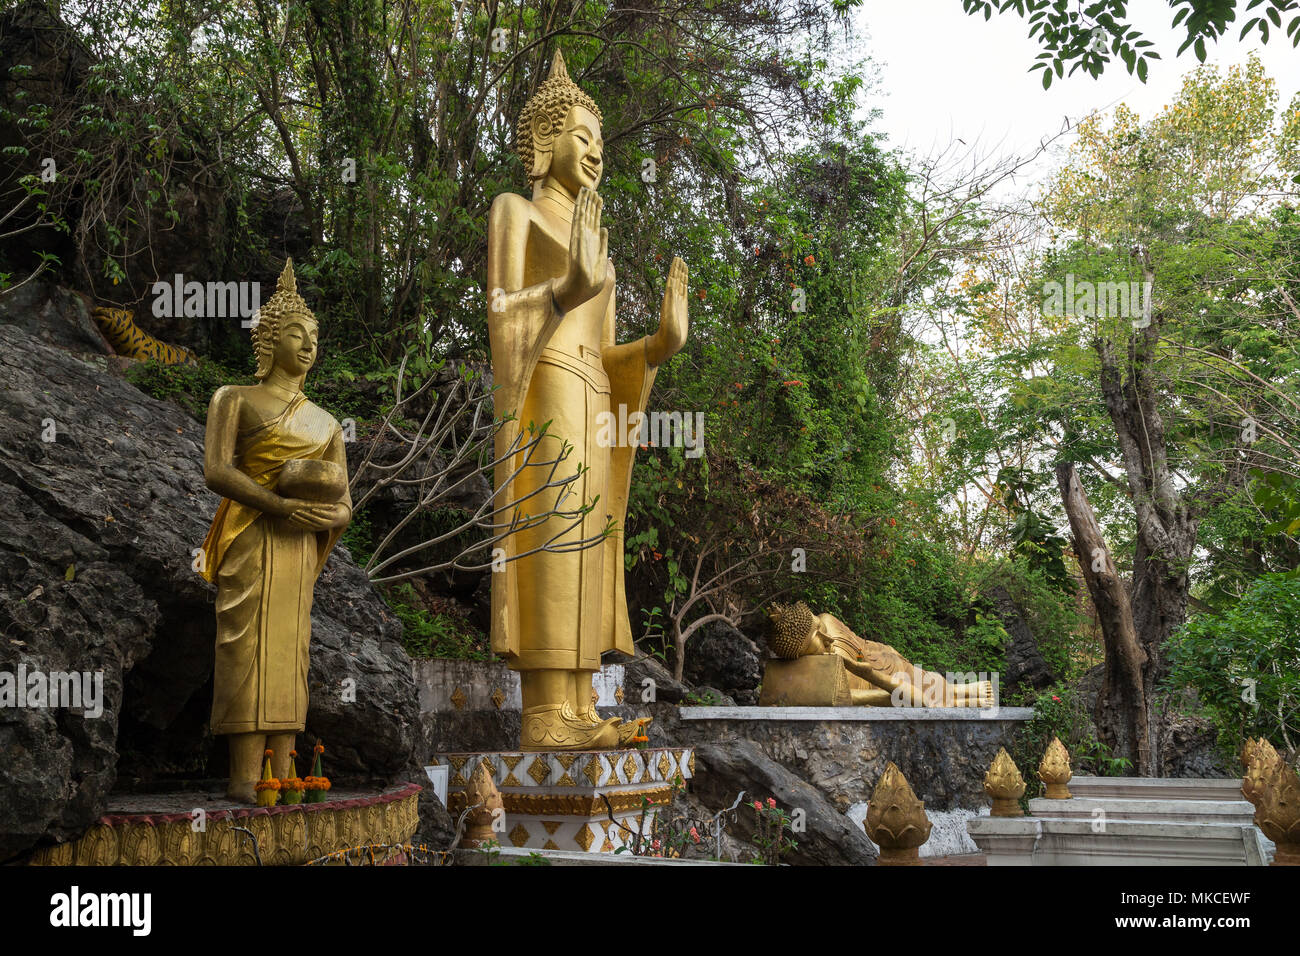 Drei goldene Buddha Statuen am Mount Phousi (Phou Si, Phusi, Phu Si) in Luang Prabang, Laos. Stockbild